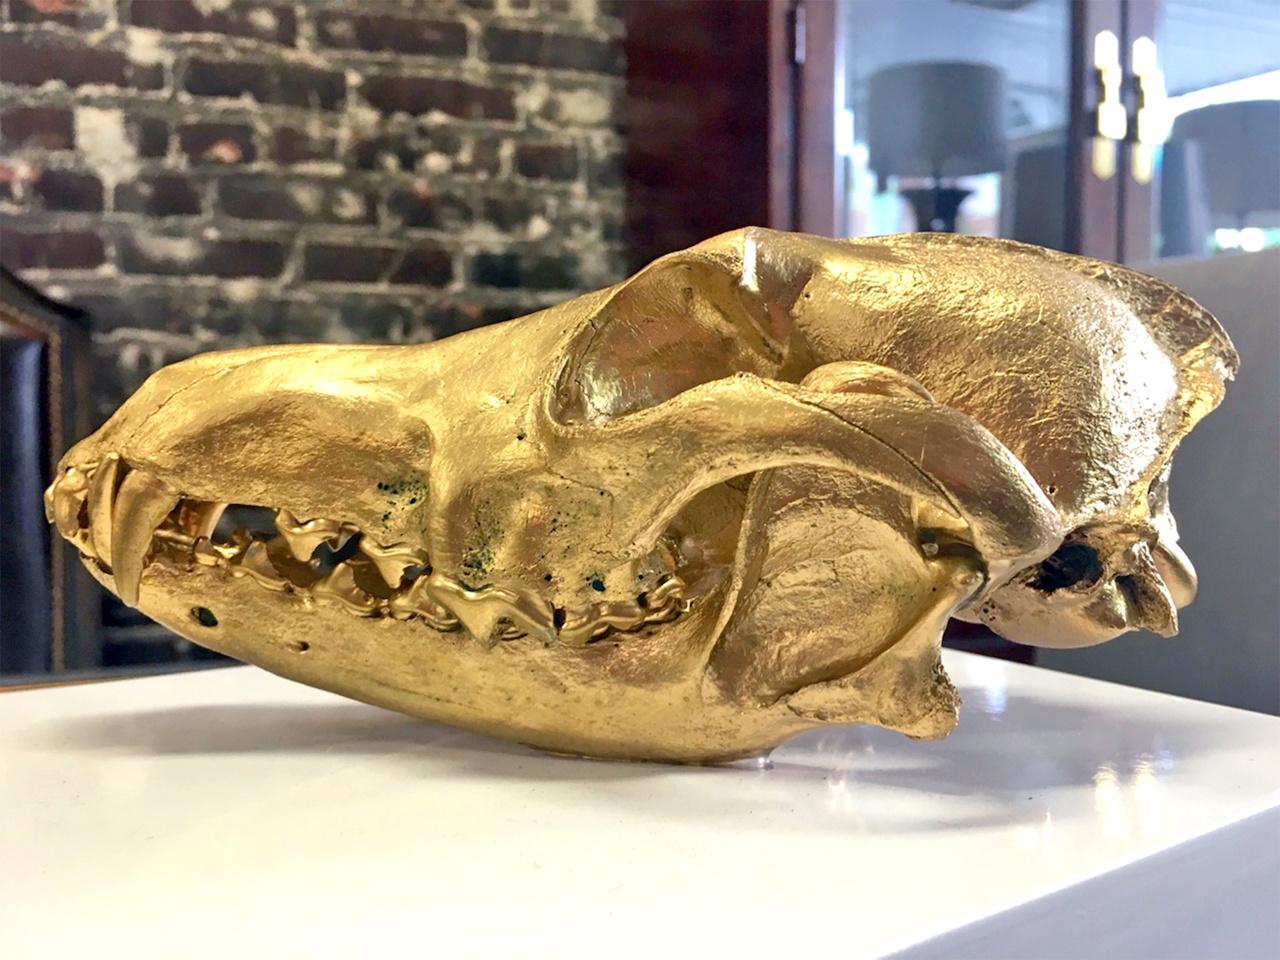 Image: Gold and White Dinosaur Box, $79.